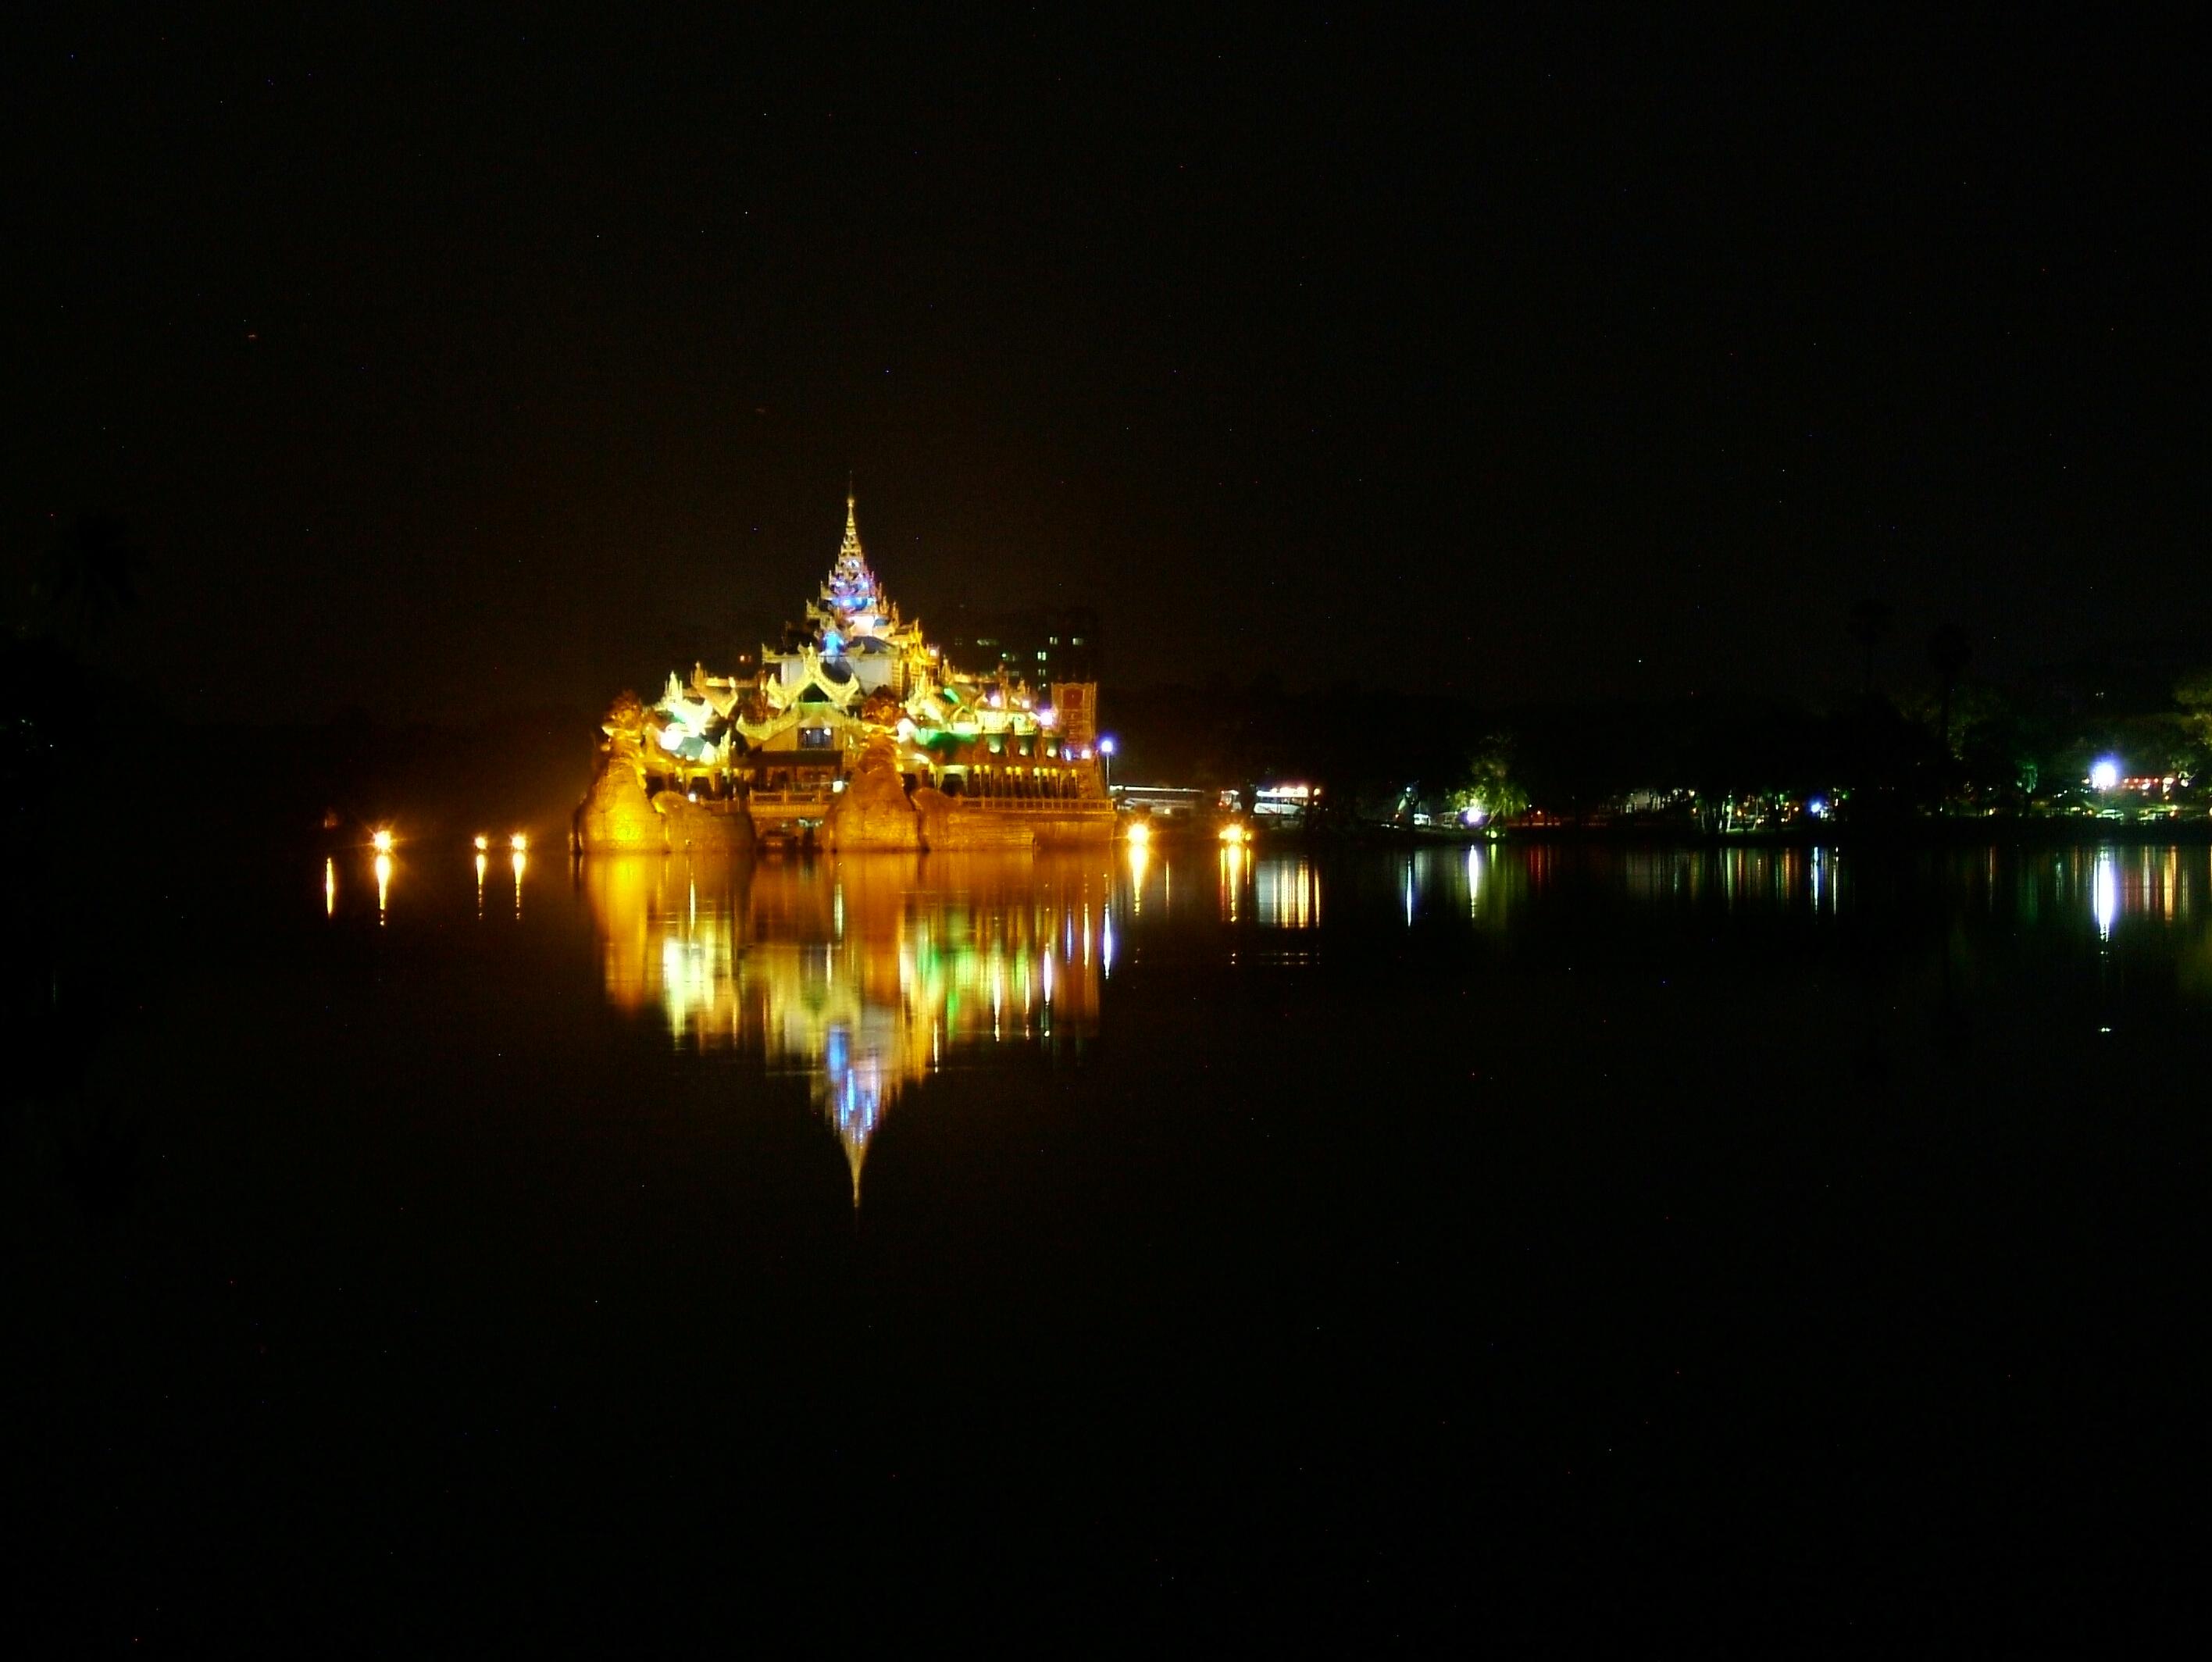 Myanmar Yangon Kandawgyi Palace Hotel royal barge Nov 2004 08